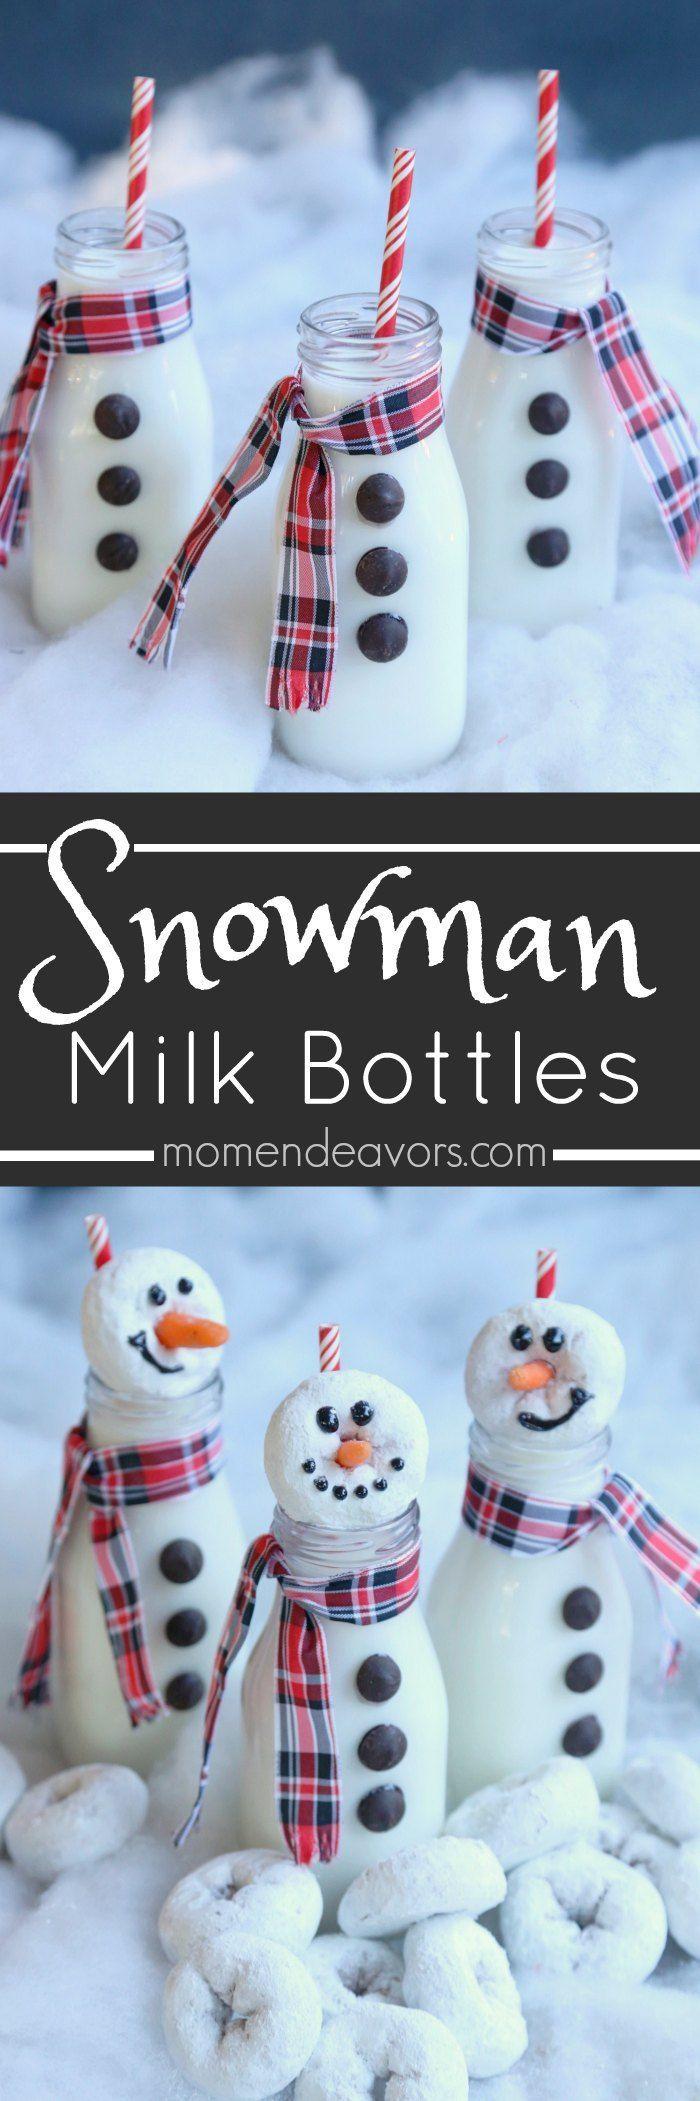 Great Cute Snowman Milk Bottles   An Adorable U0026 Easy Holiday Treat Idea! Nice Ideas